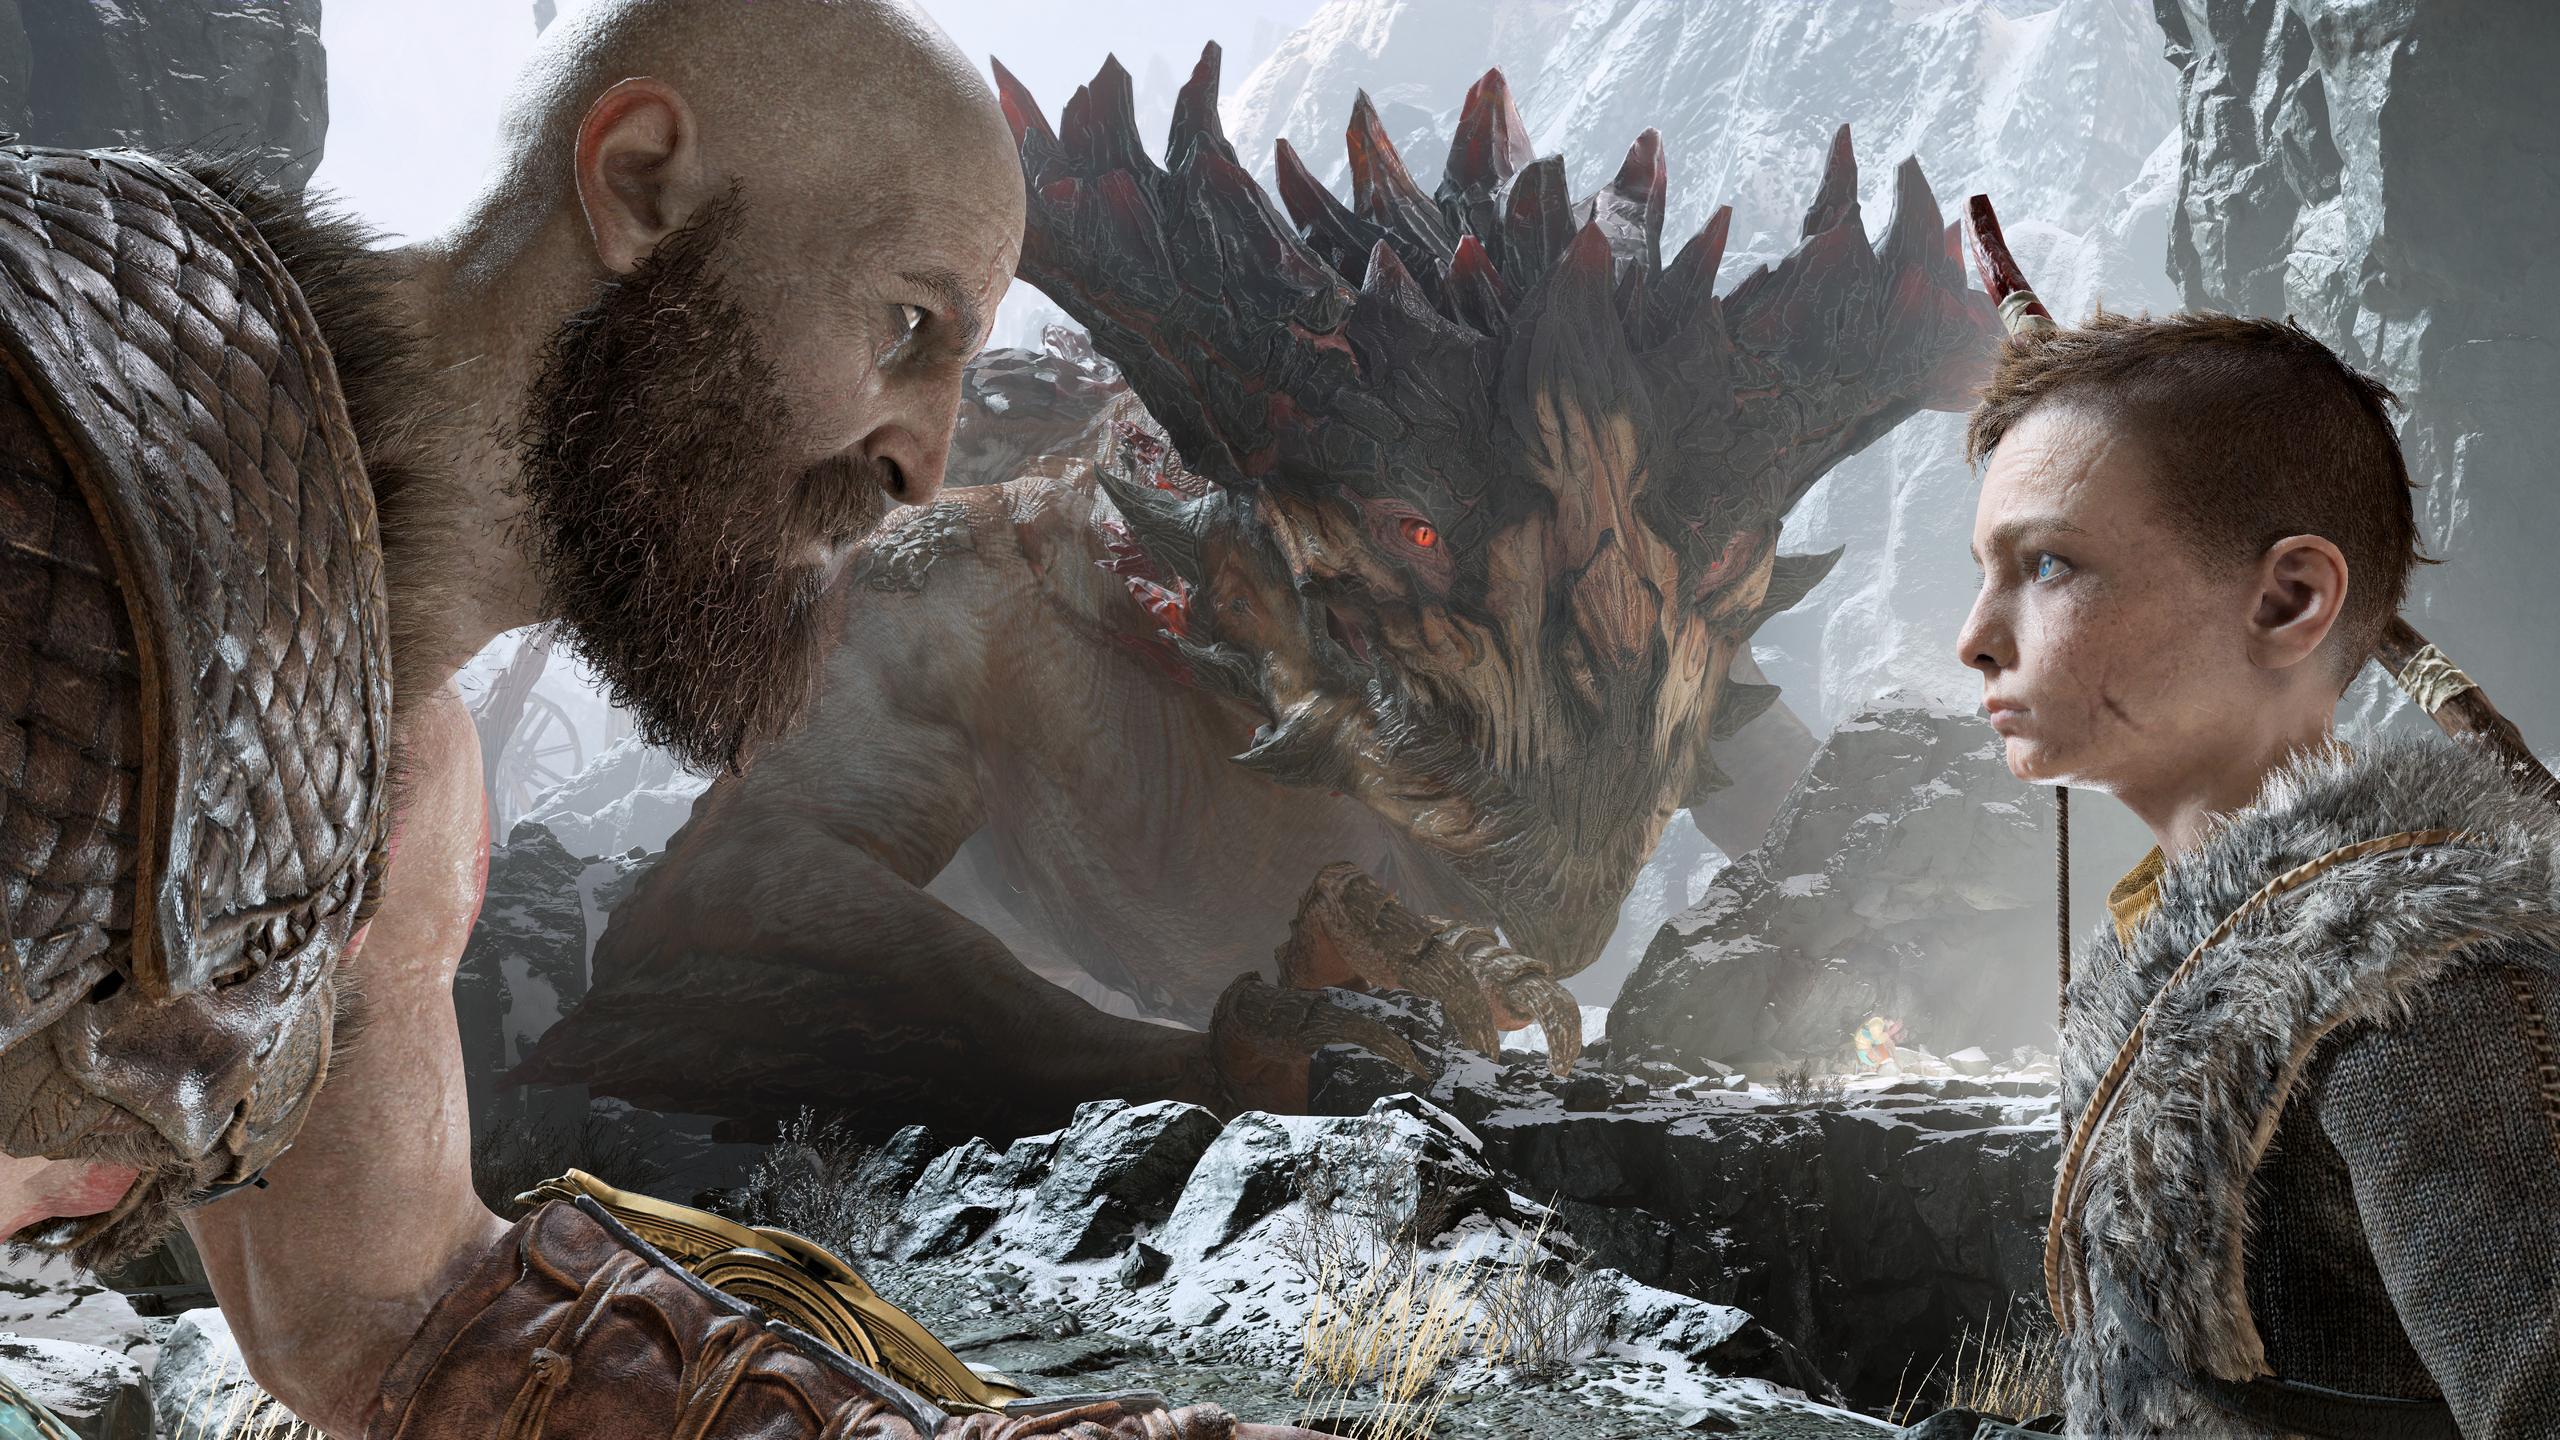 kratos-and-atreus-fanart-4k-90.jpg